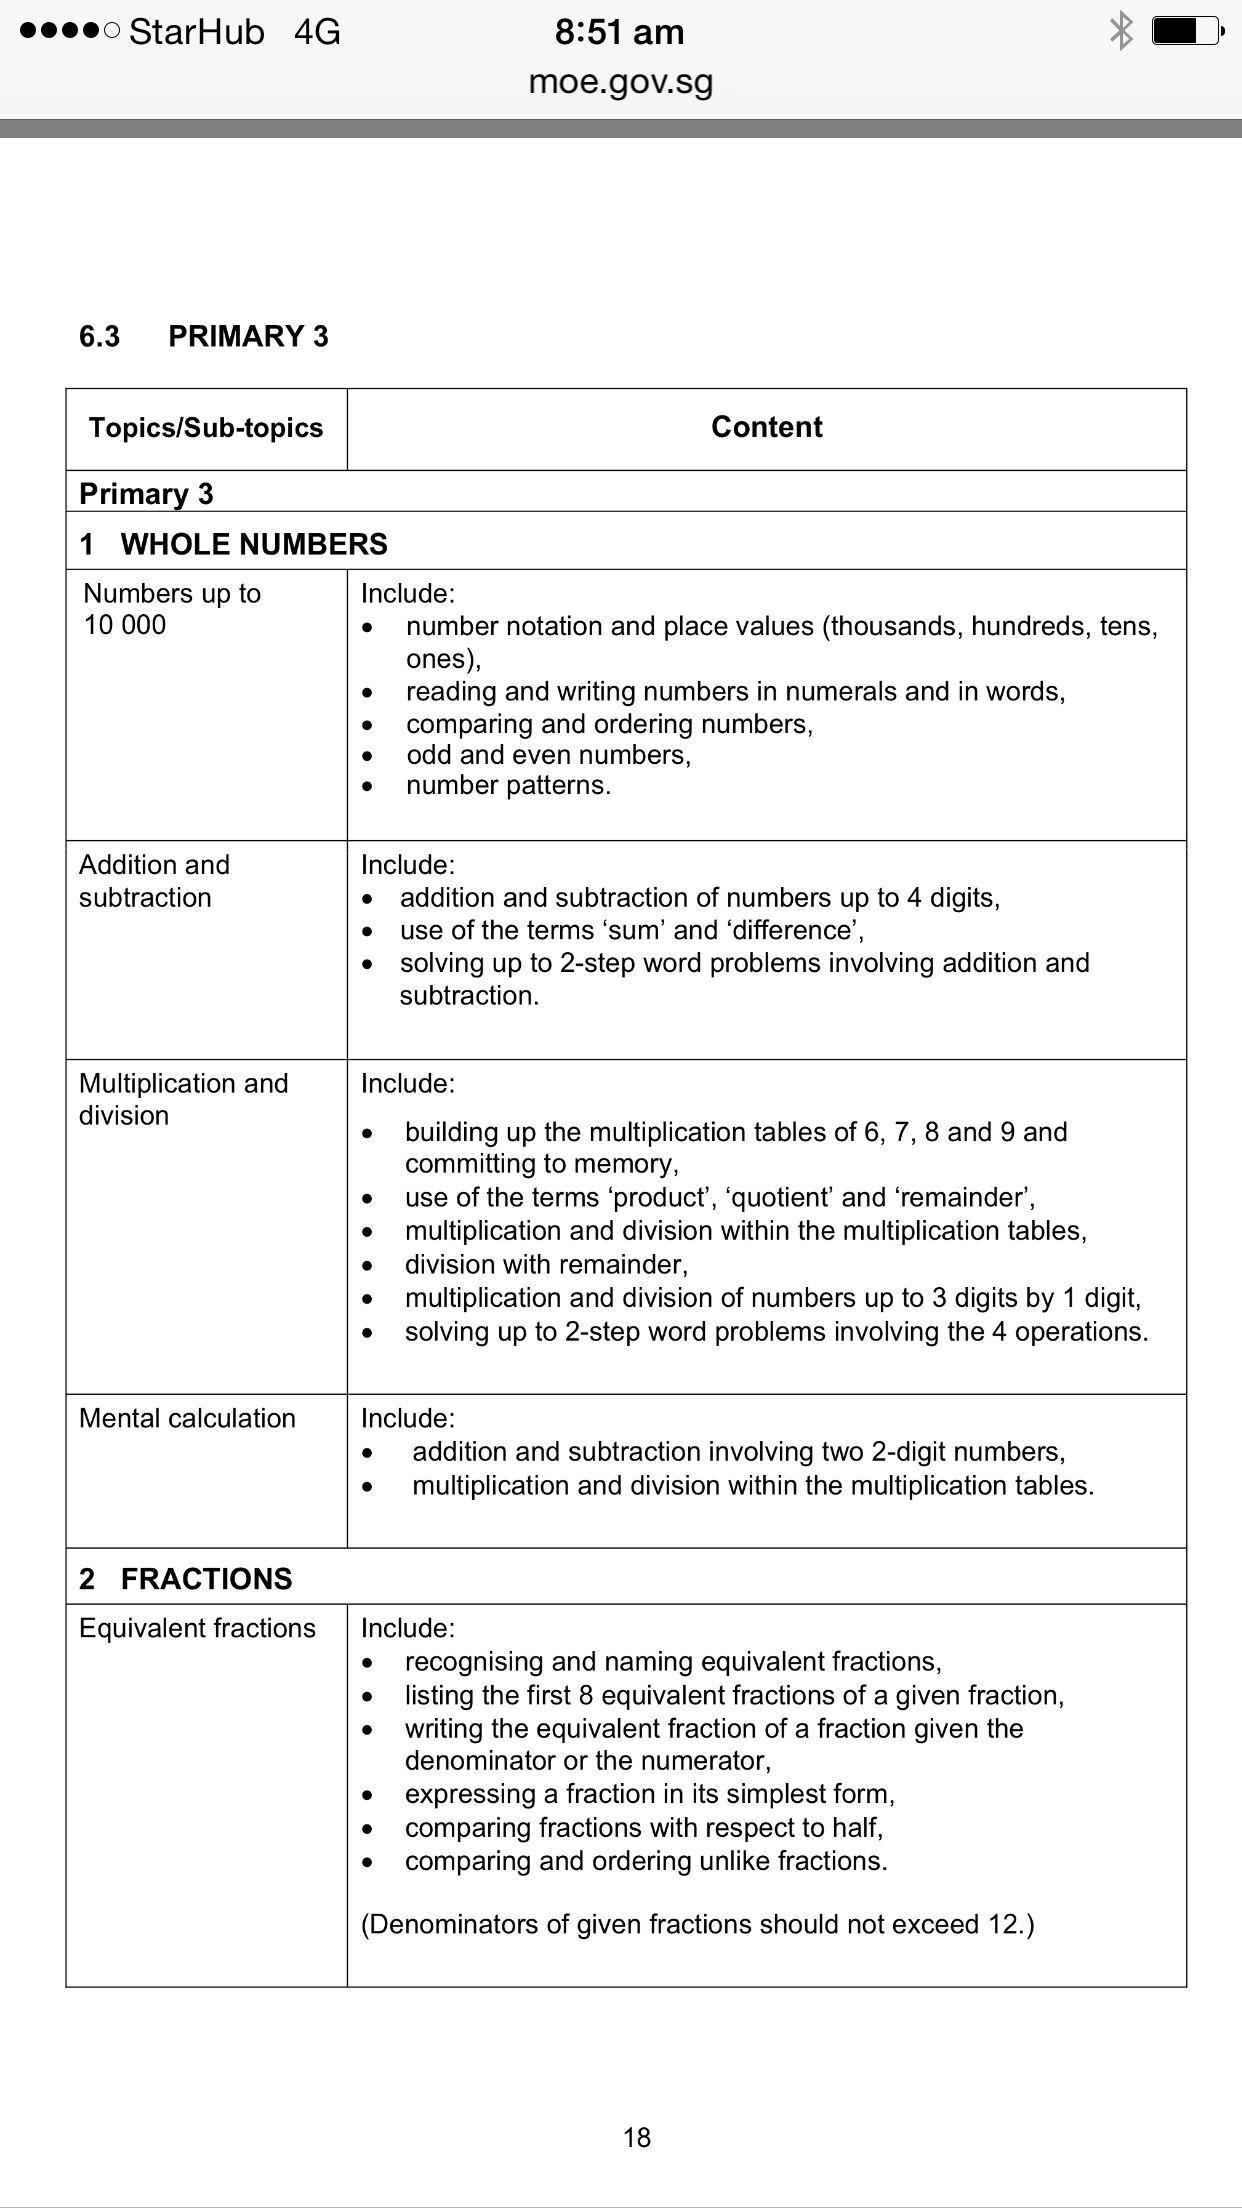 Primary 3 math page 1 | Primary 3 Math Syllabus | Pinterest | Maths ...